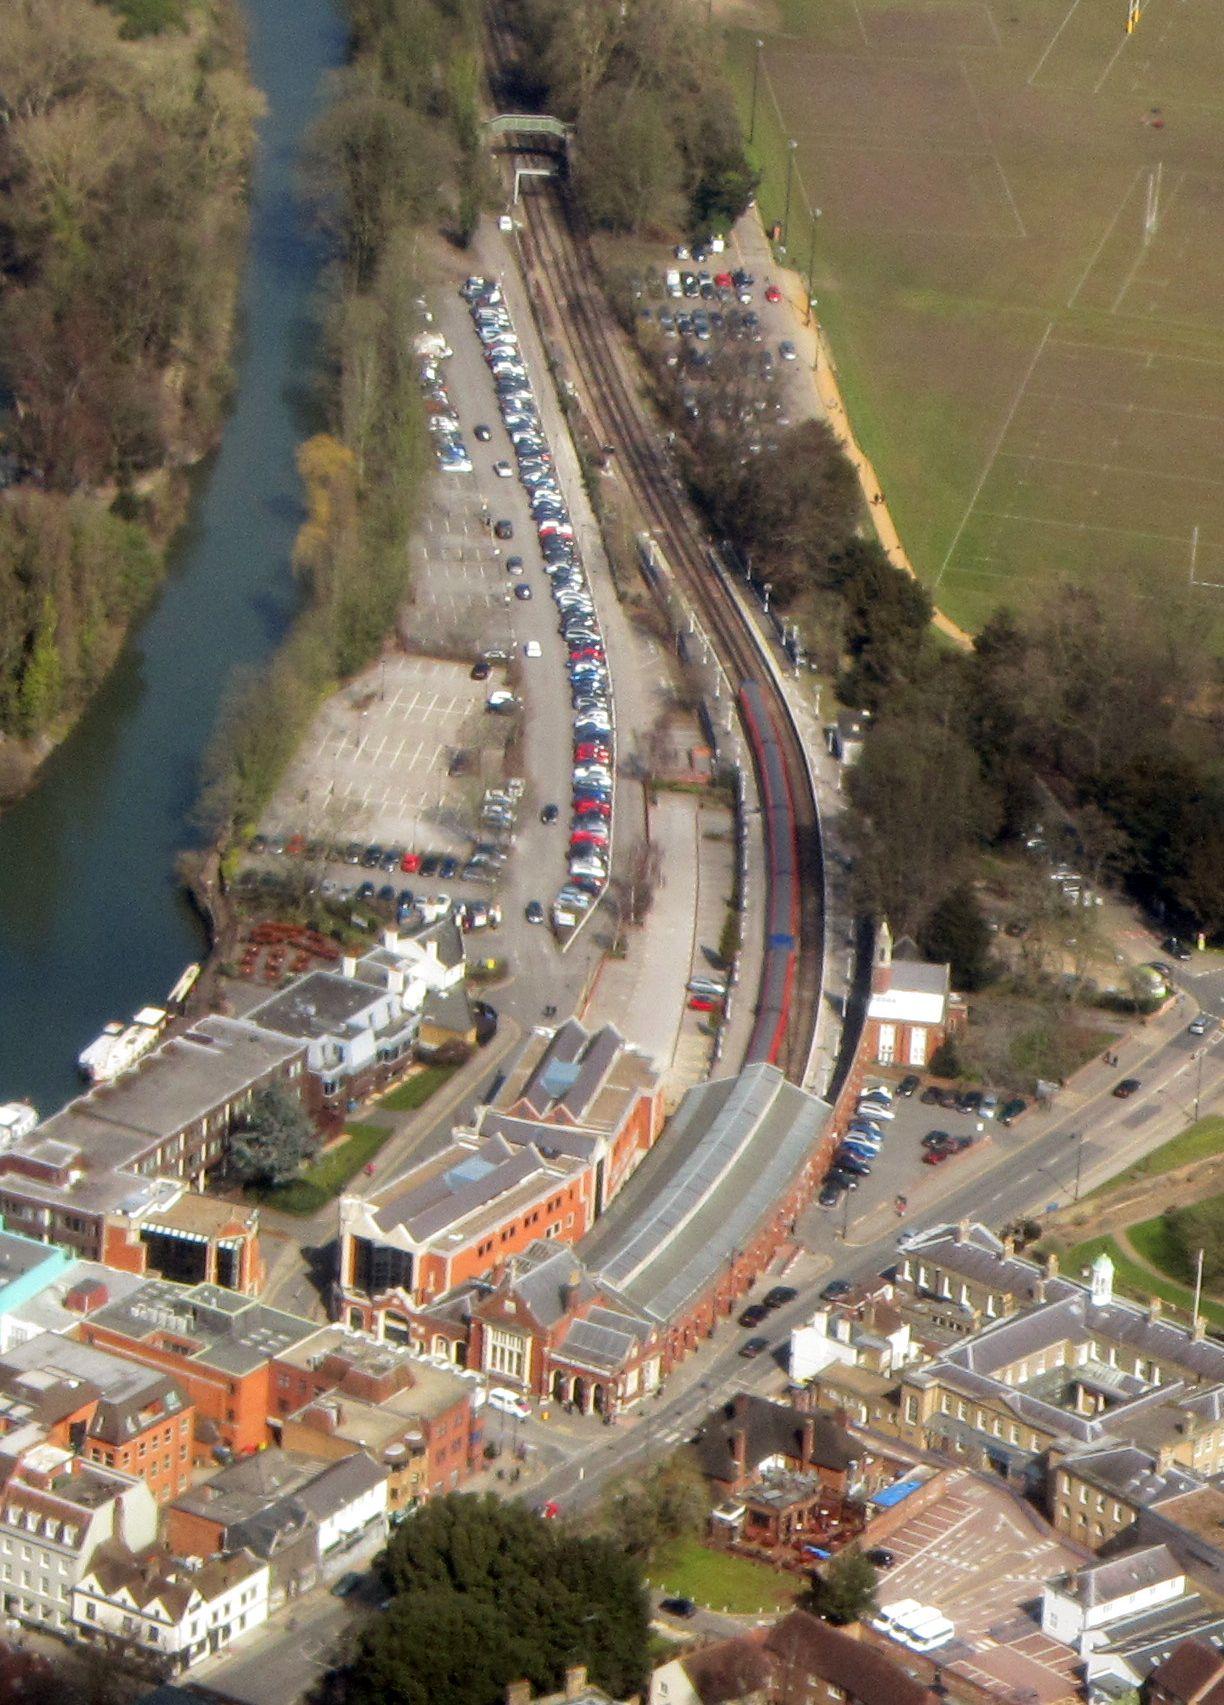 Windsor & Eton Riverside railway station - Wikipedia